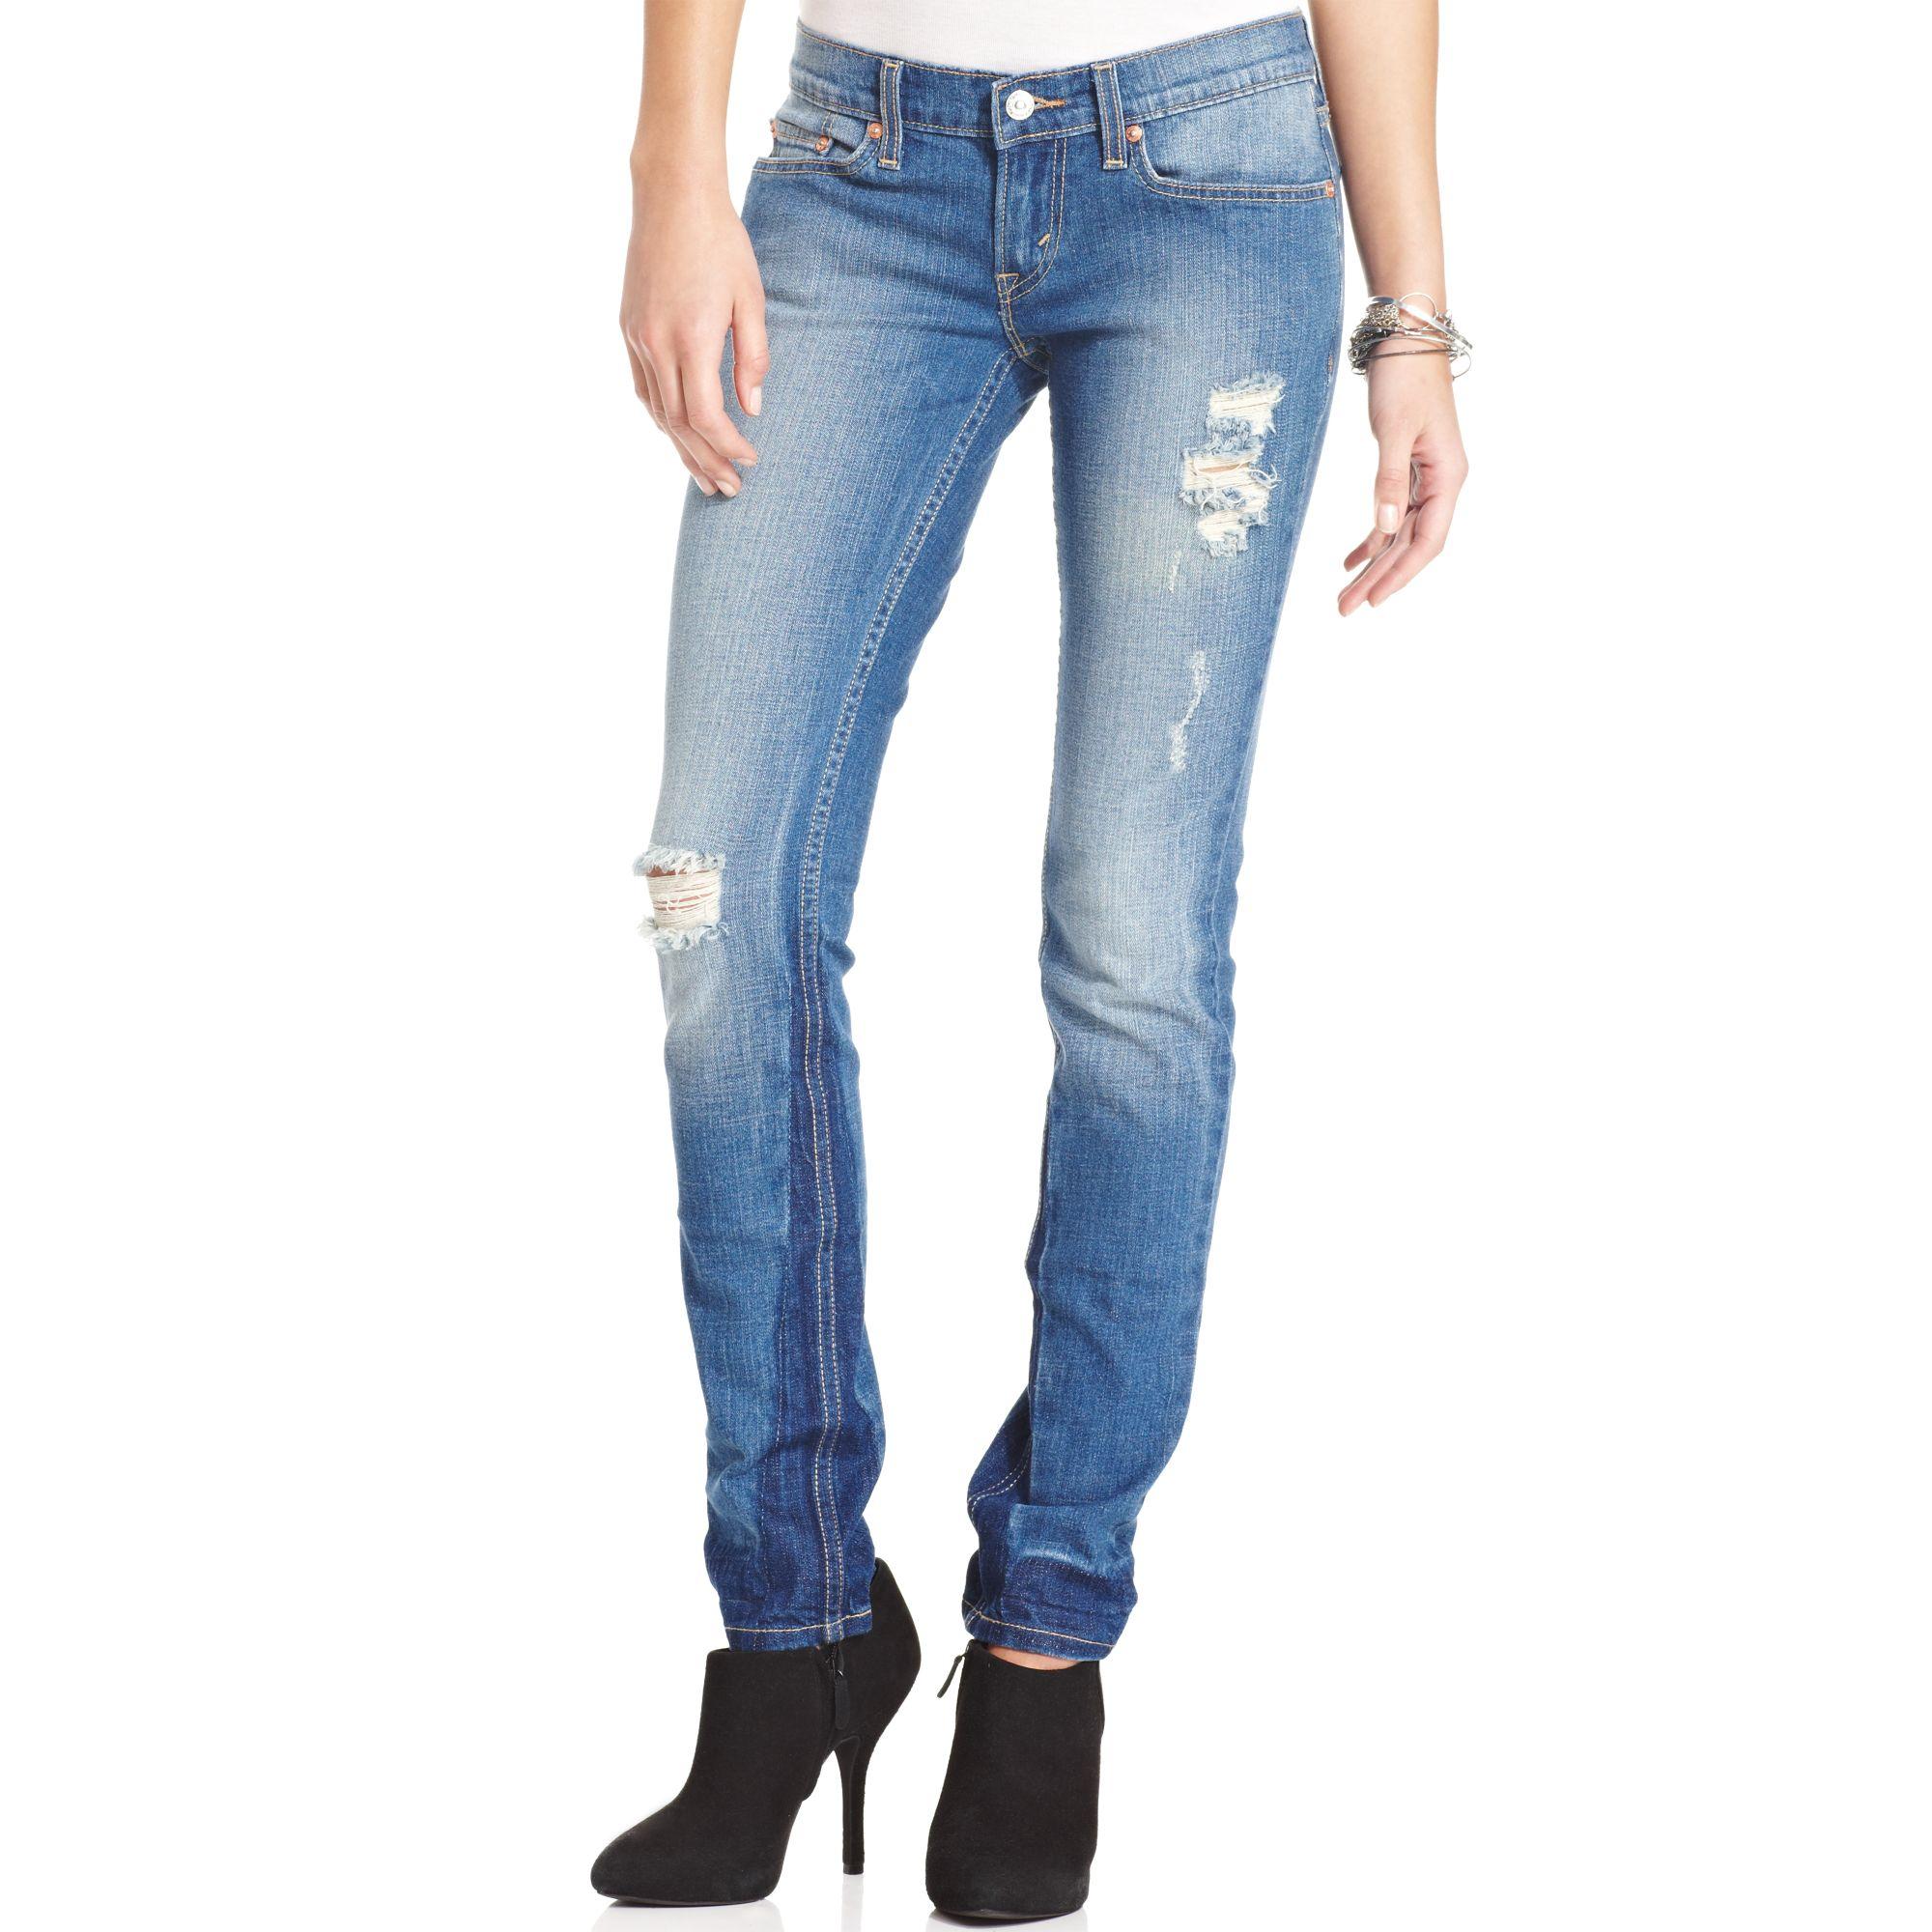 destroyed skinny jeans for juniors kkclub 2016